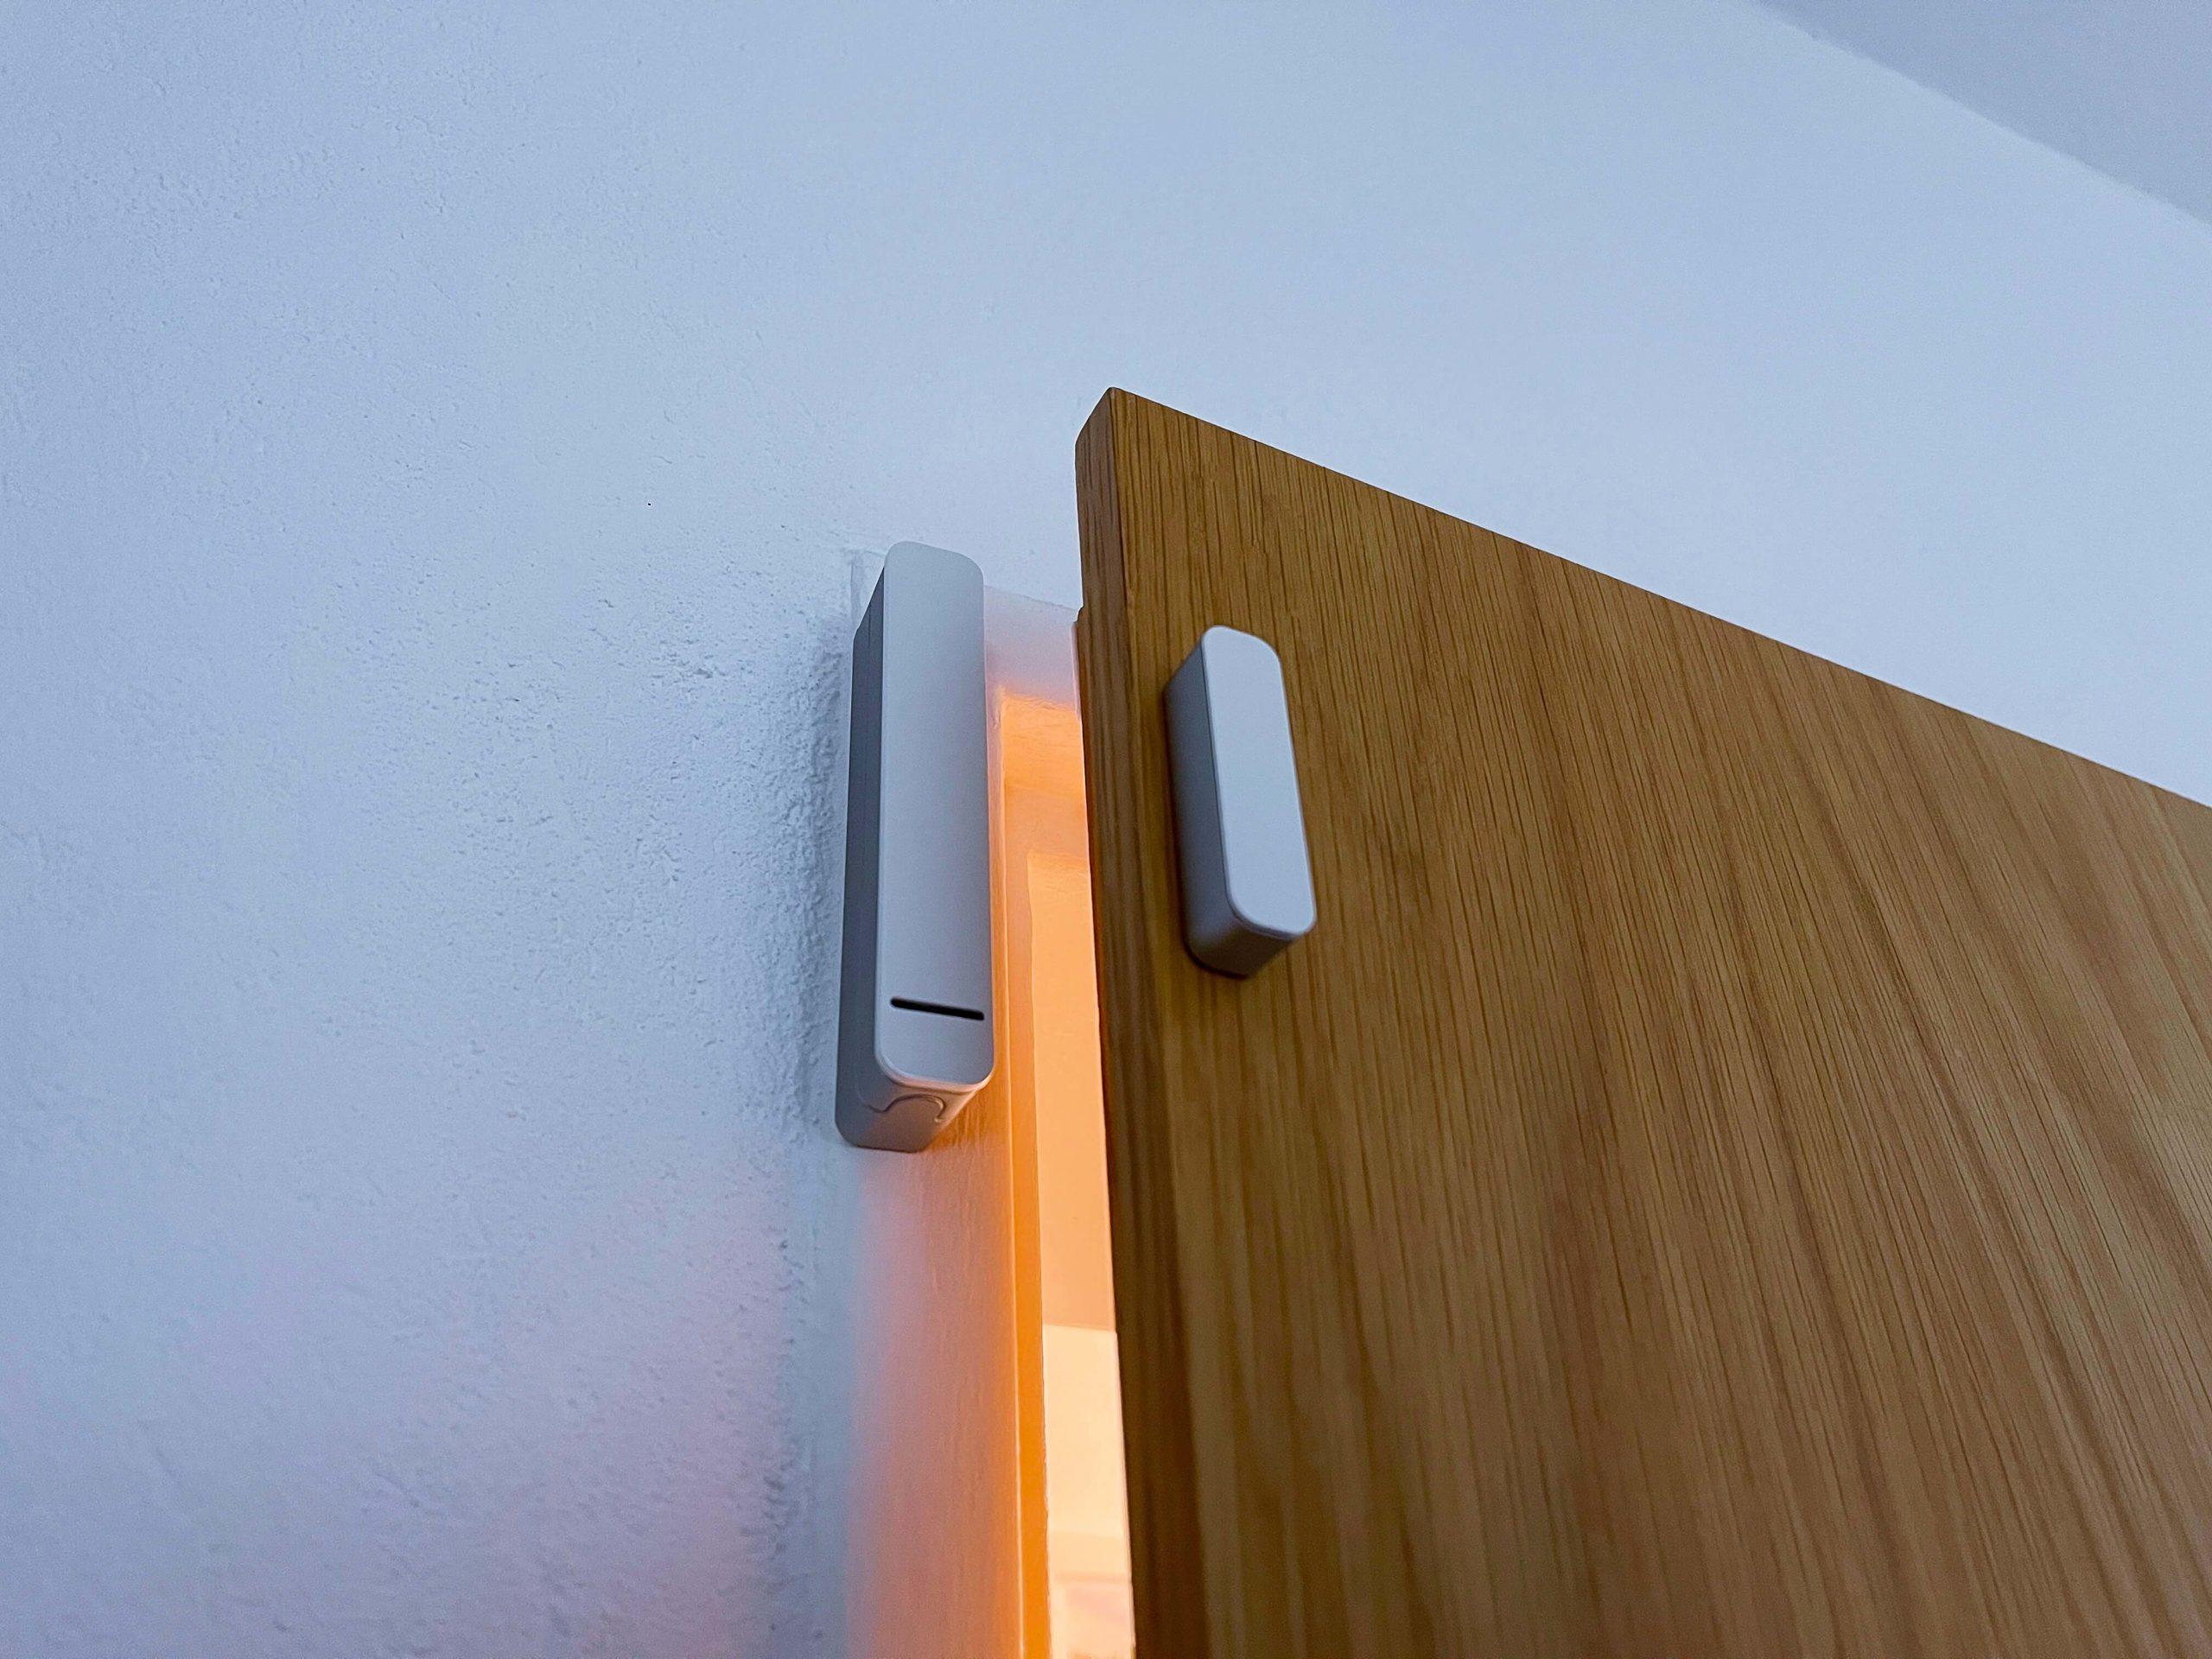 Bosch-Smart-Home-in-Perfektion-mit-Apple-HomeKit4-scaled Bosch Smart Home - in Perfektion mit Apple HomeKit